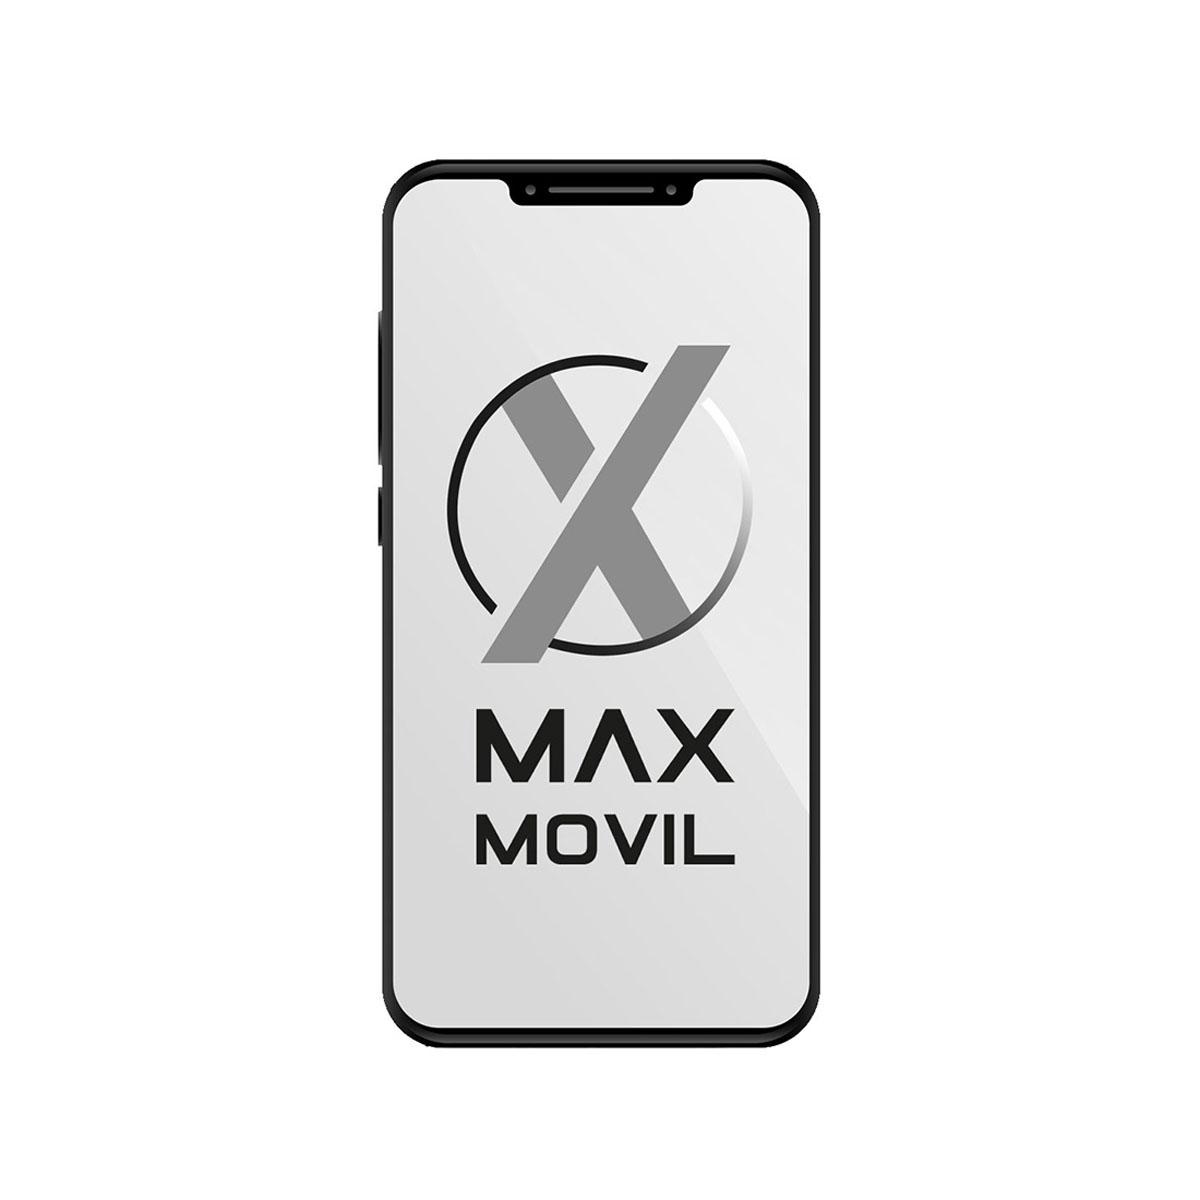 Batería para LG CU515 y LG LX400 (LGIP-520A)